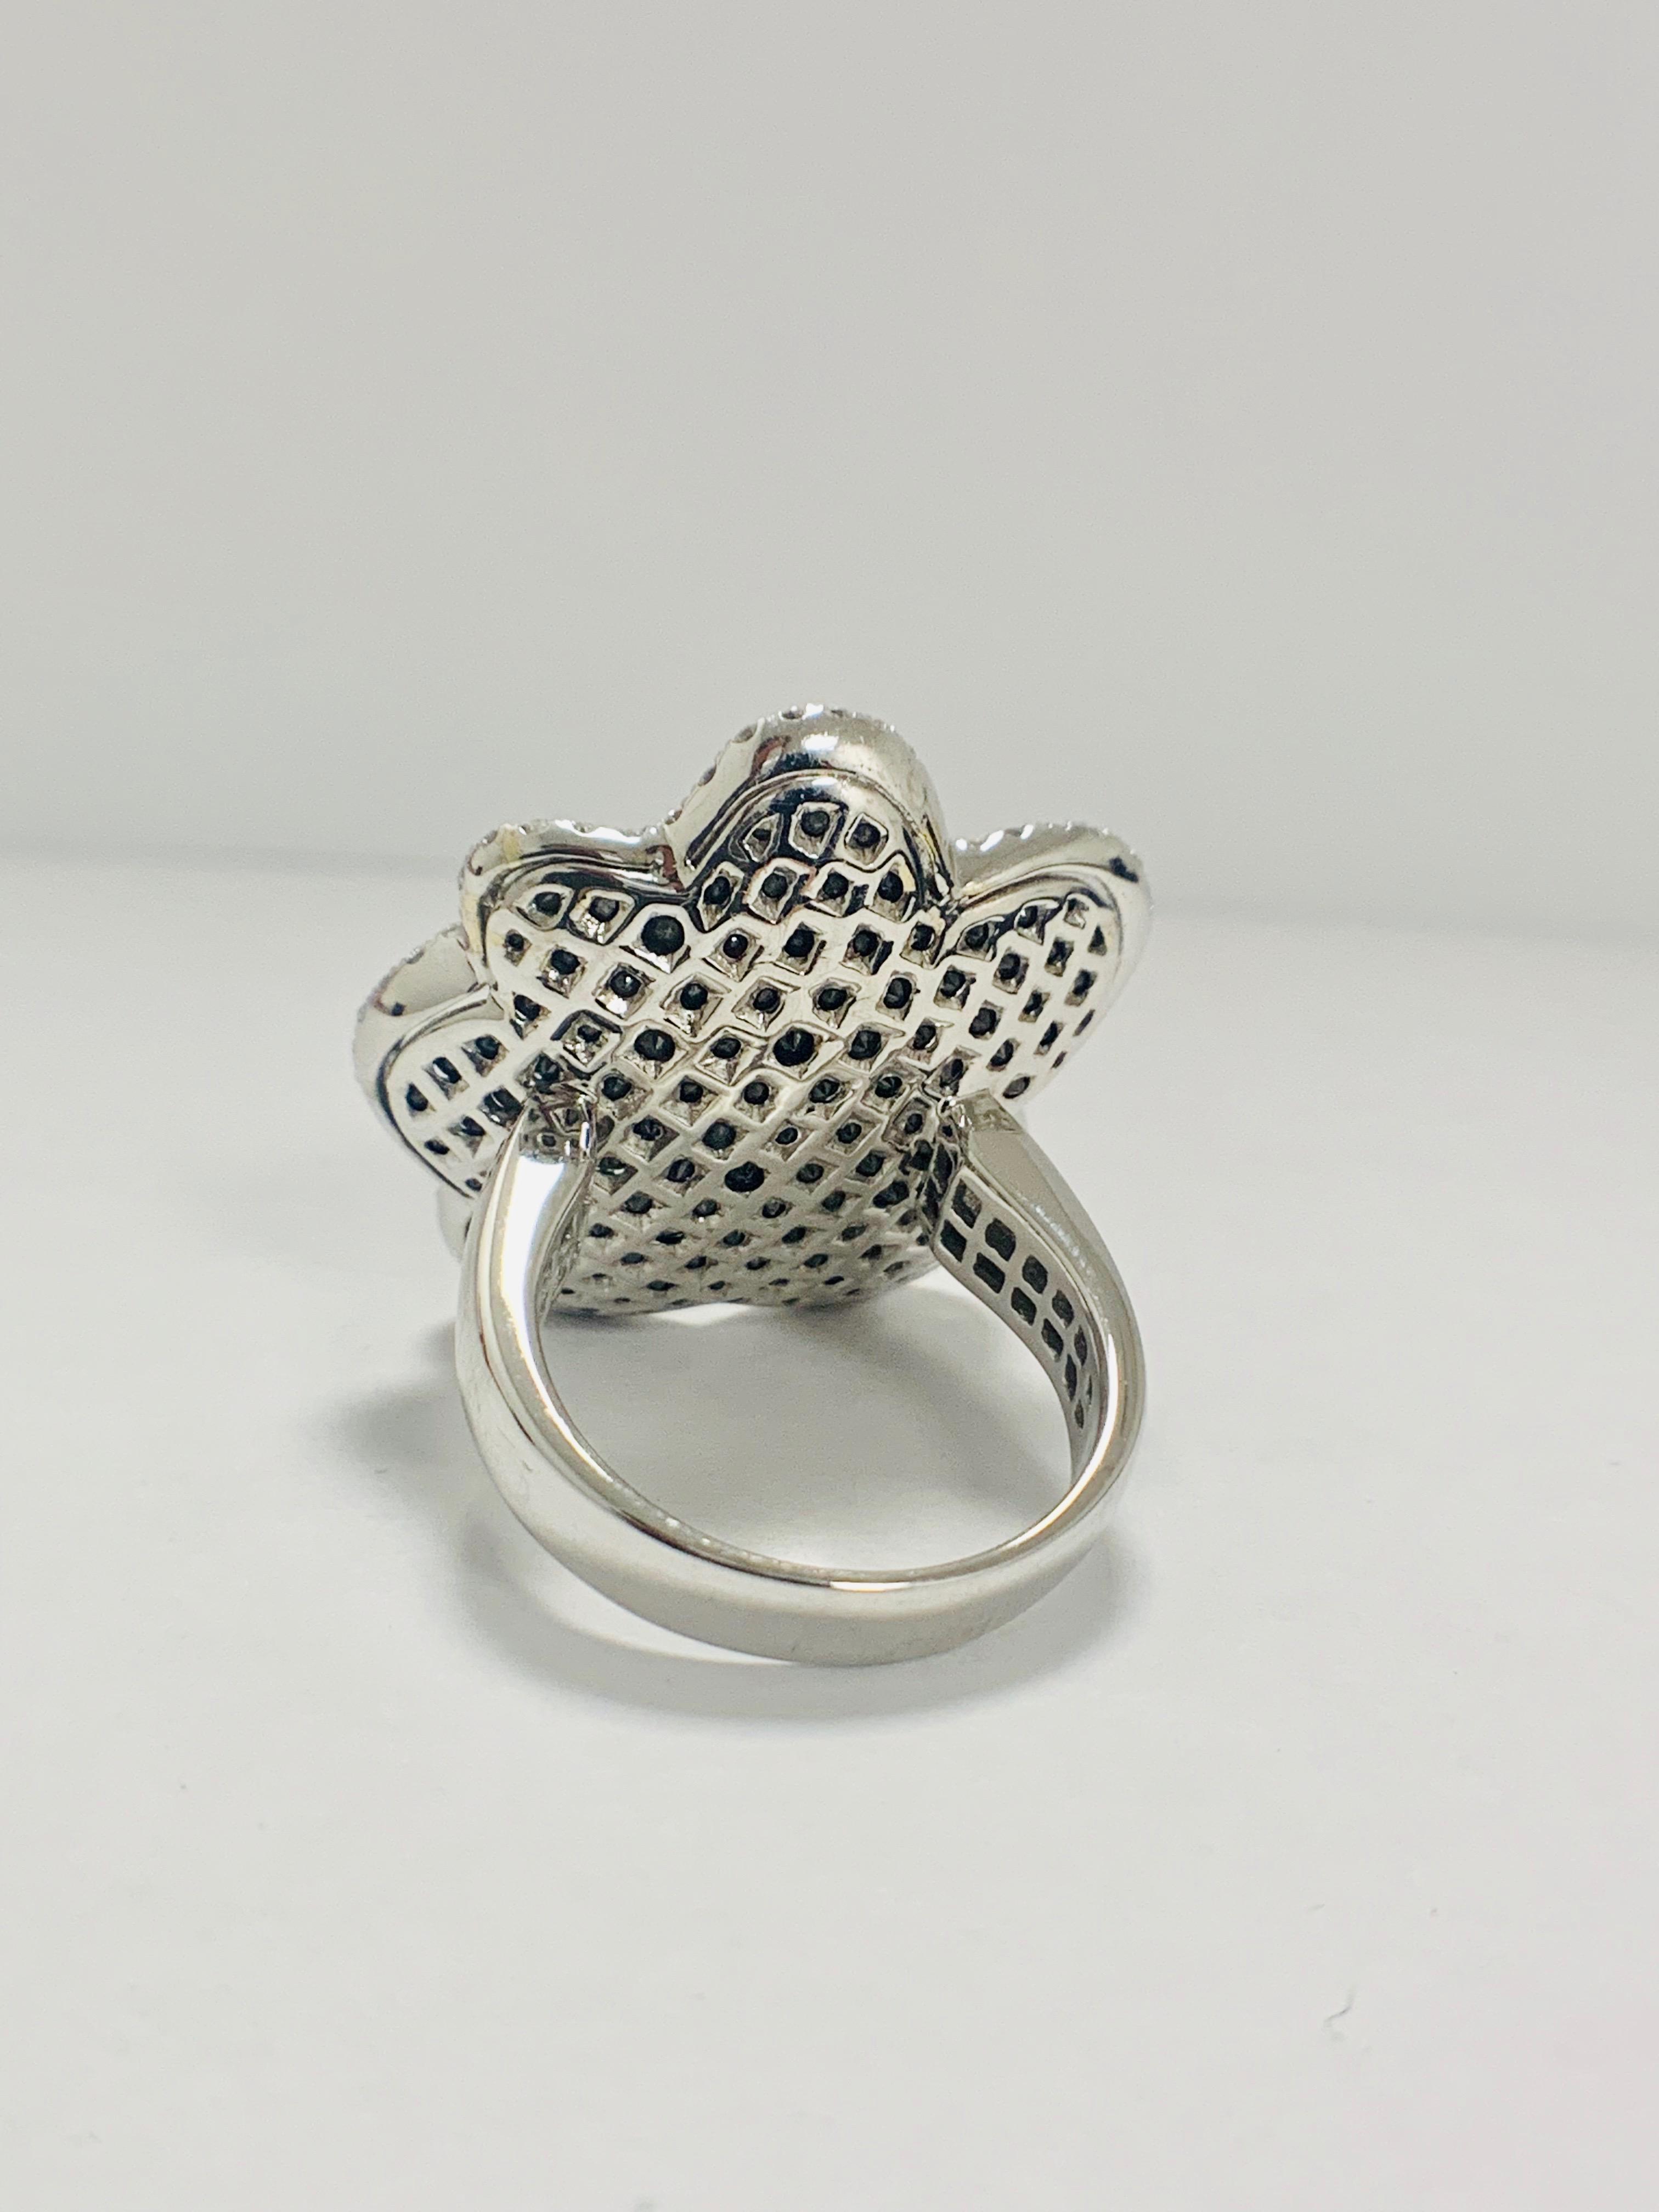 18ct White Gold Diamond flower design ring featuring 123 round cut, black Diamonds (2.25ct TBDW) - Image 4 of 13